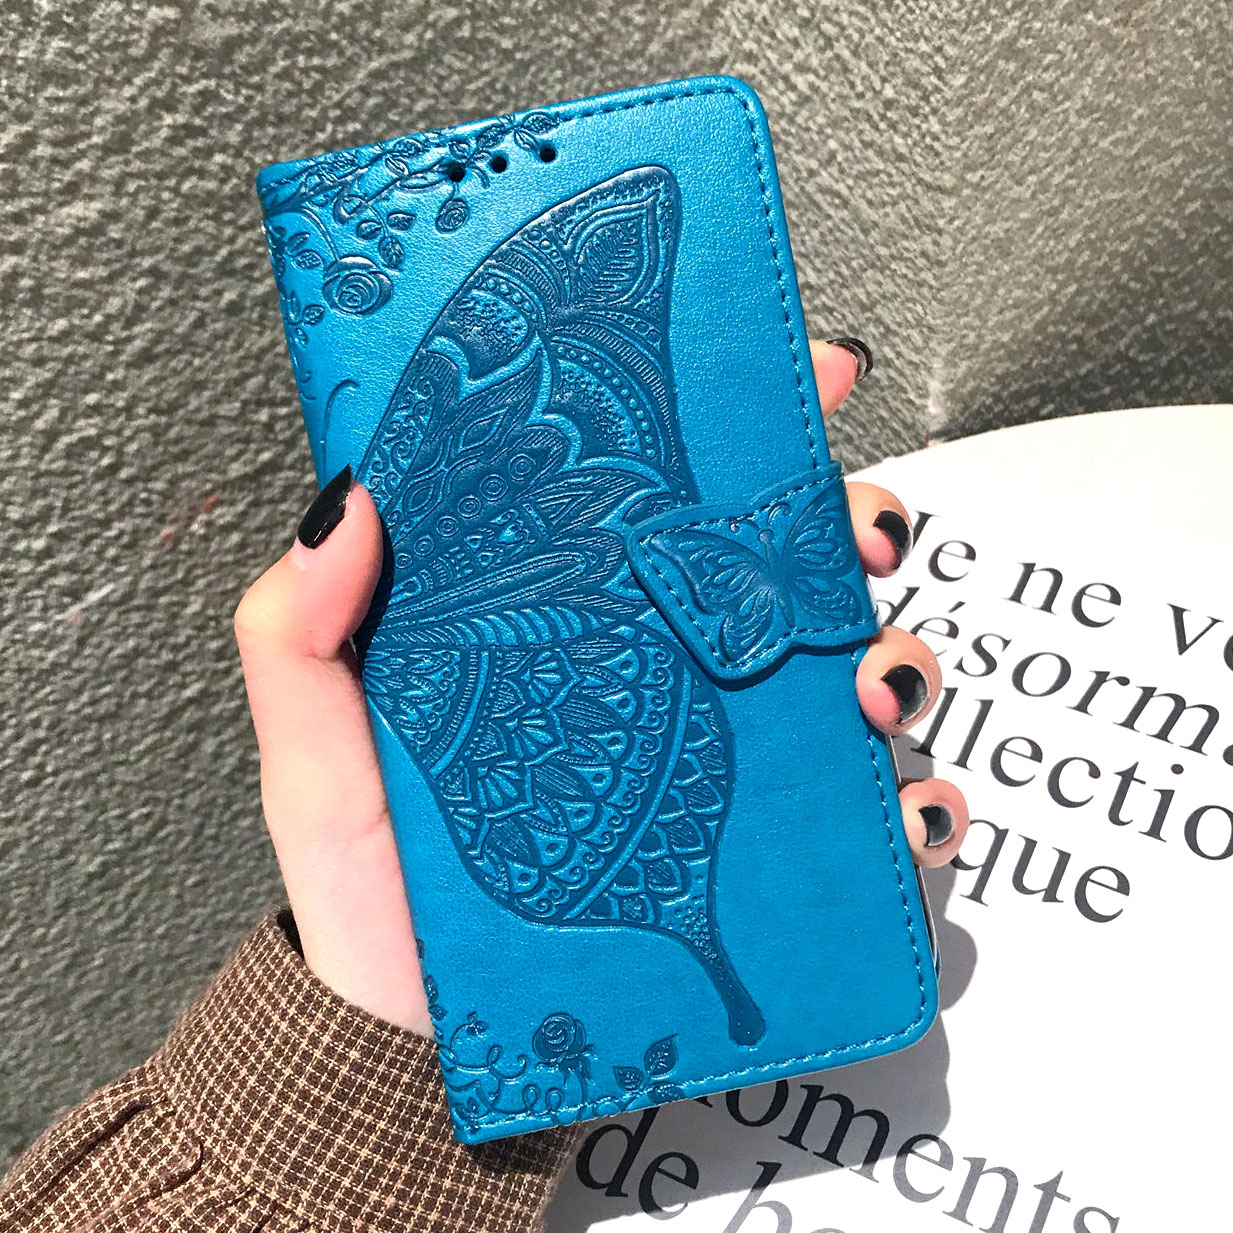 J4 Plus PU Leather Flip Case For Samsung Galaxy J4 Plus Phone Case For Samsung Galaxy J4 Plus 2018 J415F J415 SM-J415F J4Plus